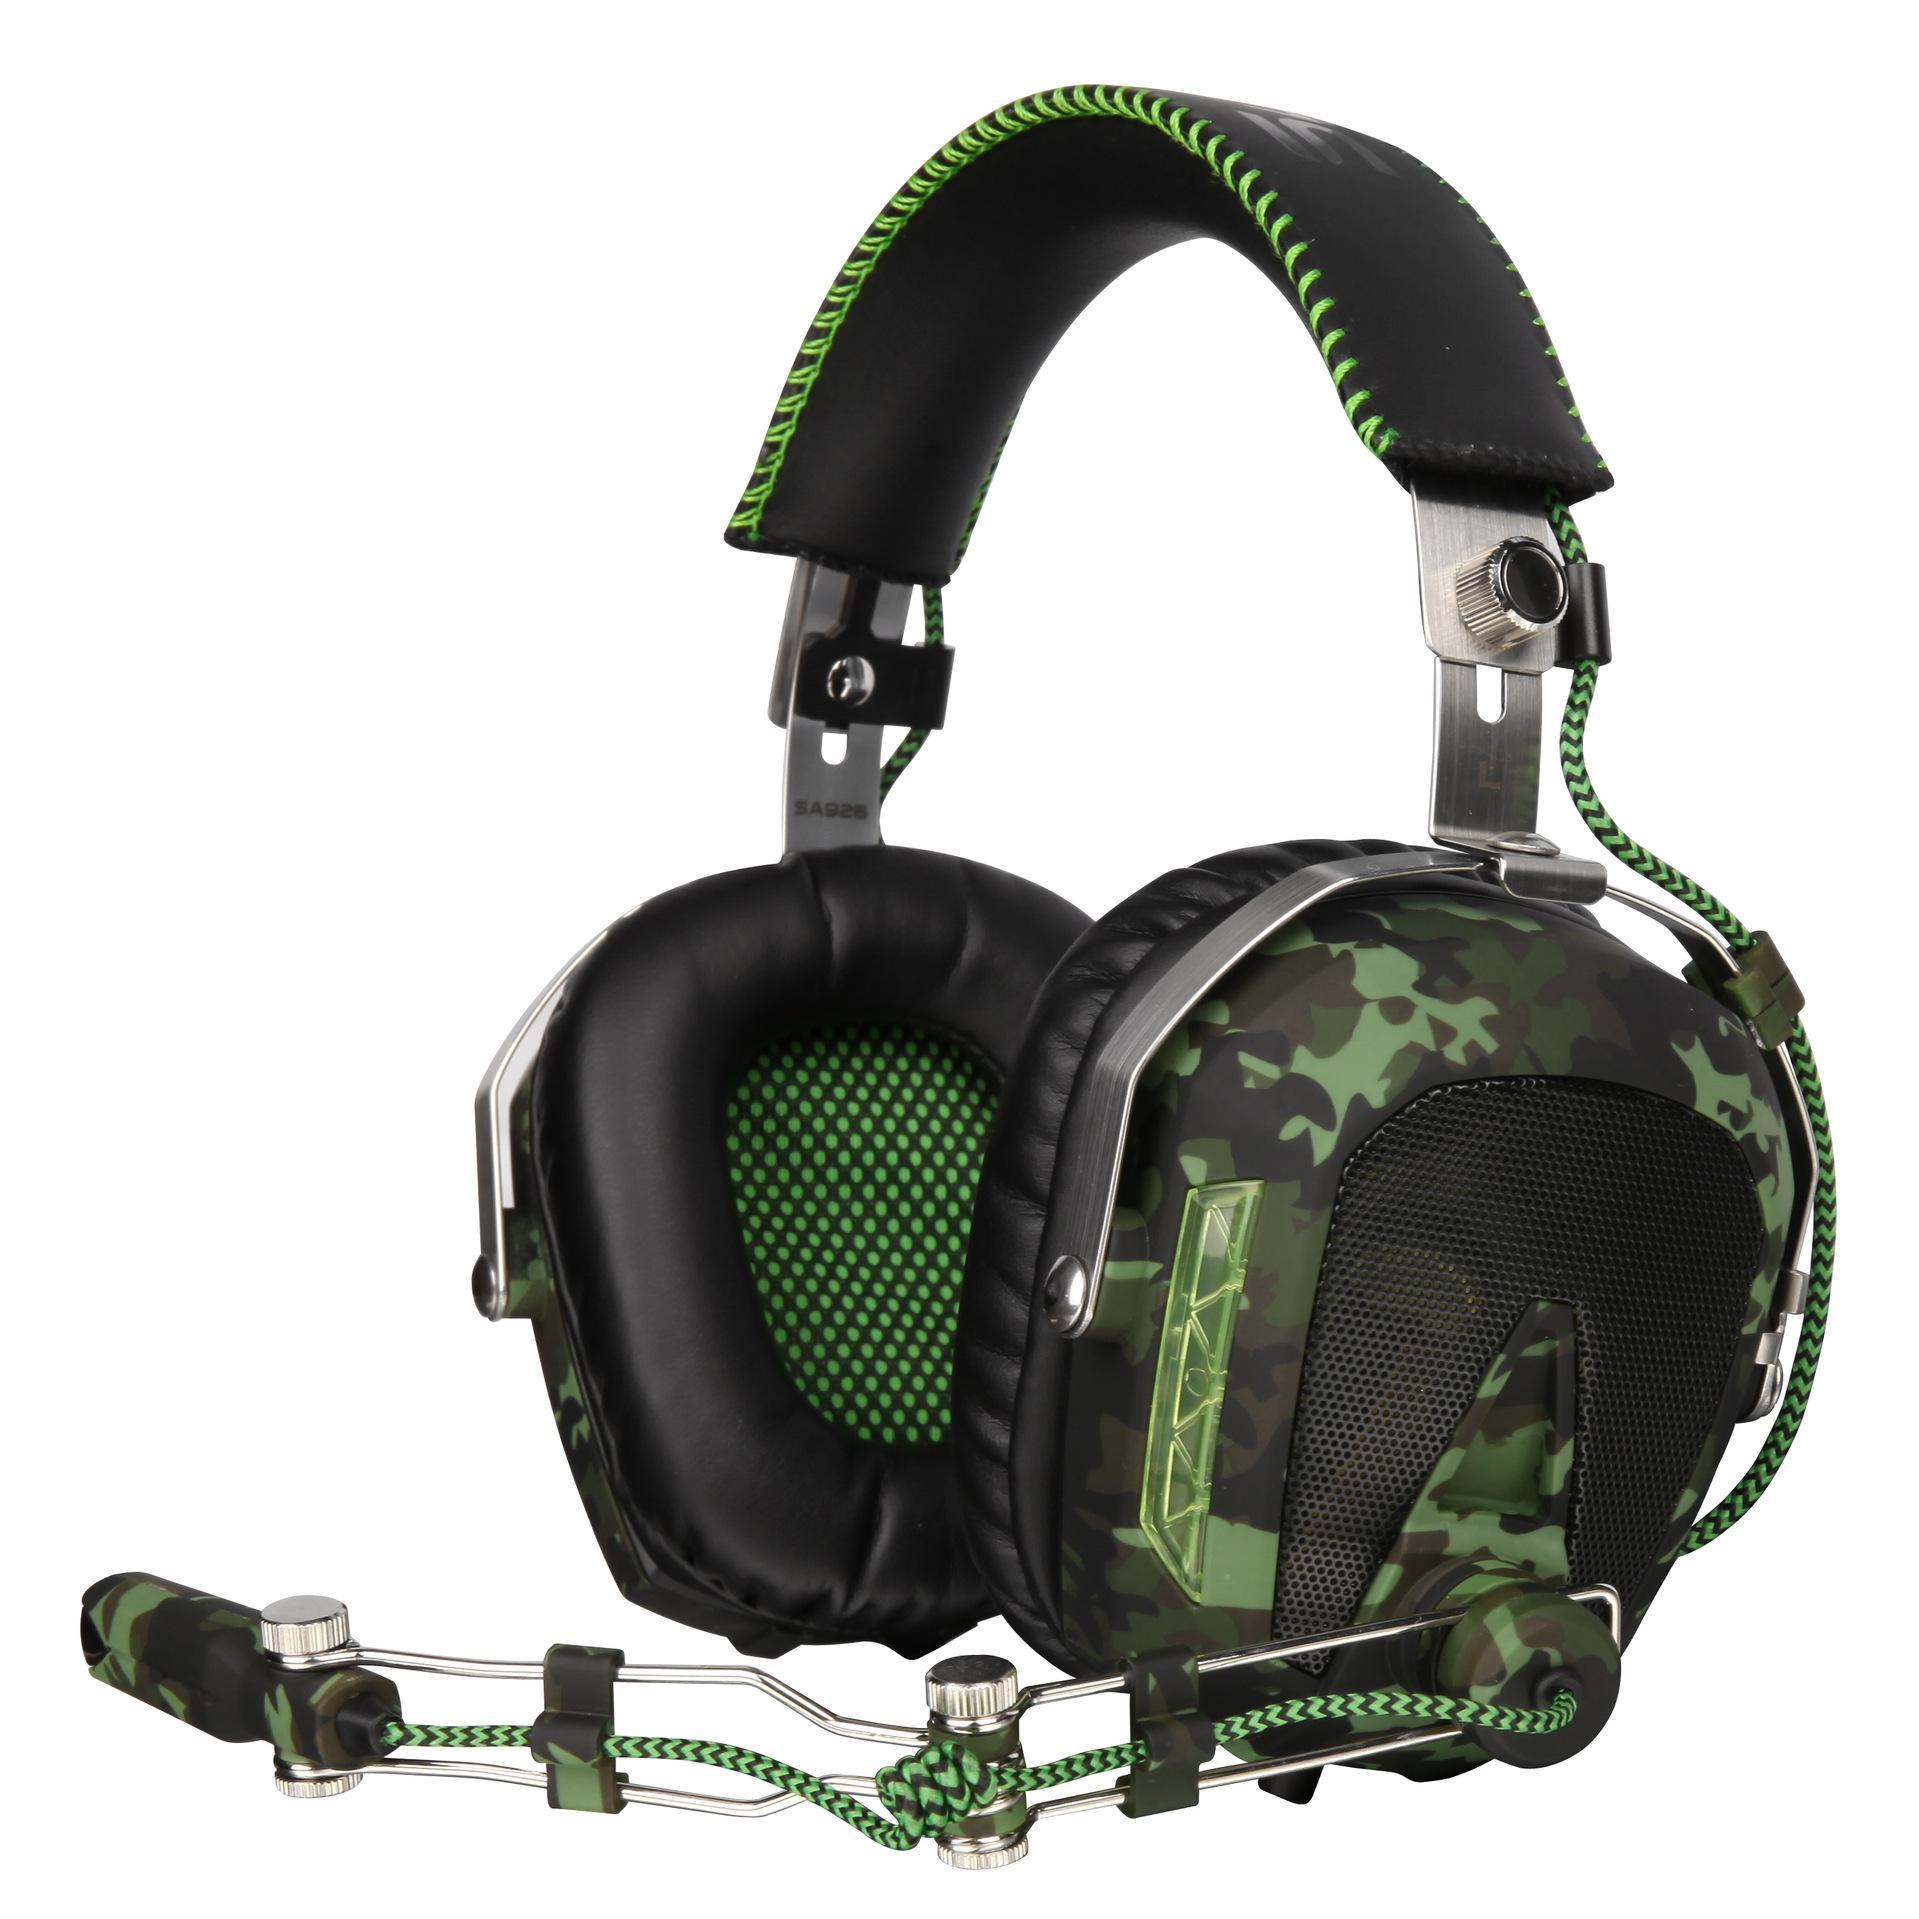 Buy Sell Cheapest Sades Sa926 Headset Best Quality Product Deals T Power Sa 701 Gaming Saides Permainan Video Langsung Tide